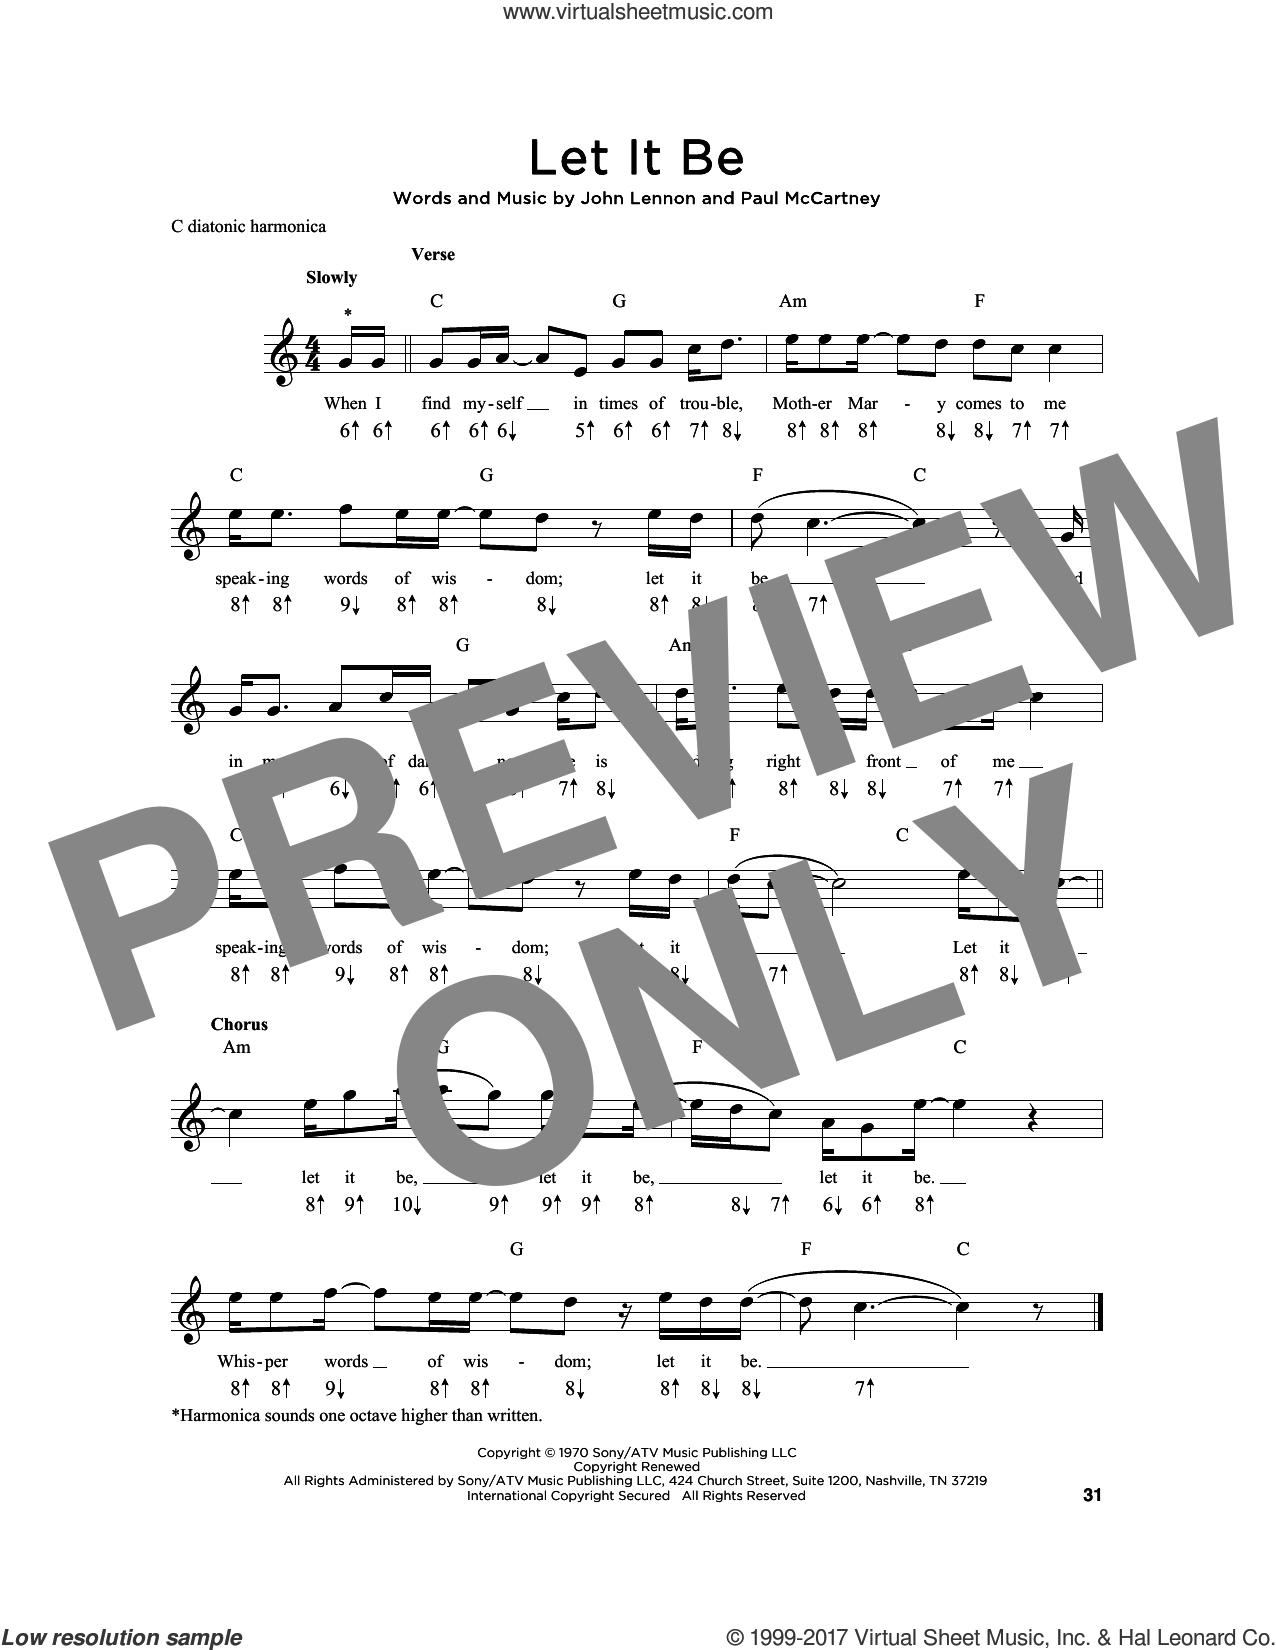 Let It Be sheet music for harmonica solo by The Beatles, John Lennon and Paul McCartney, intermediate skill level